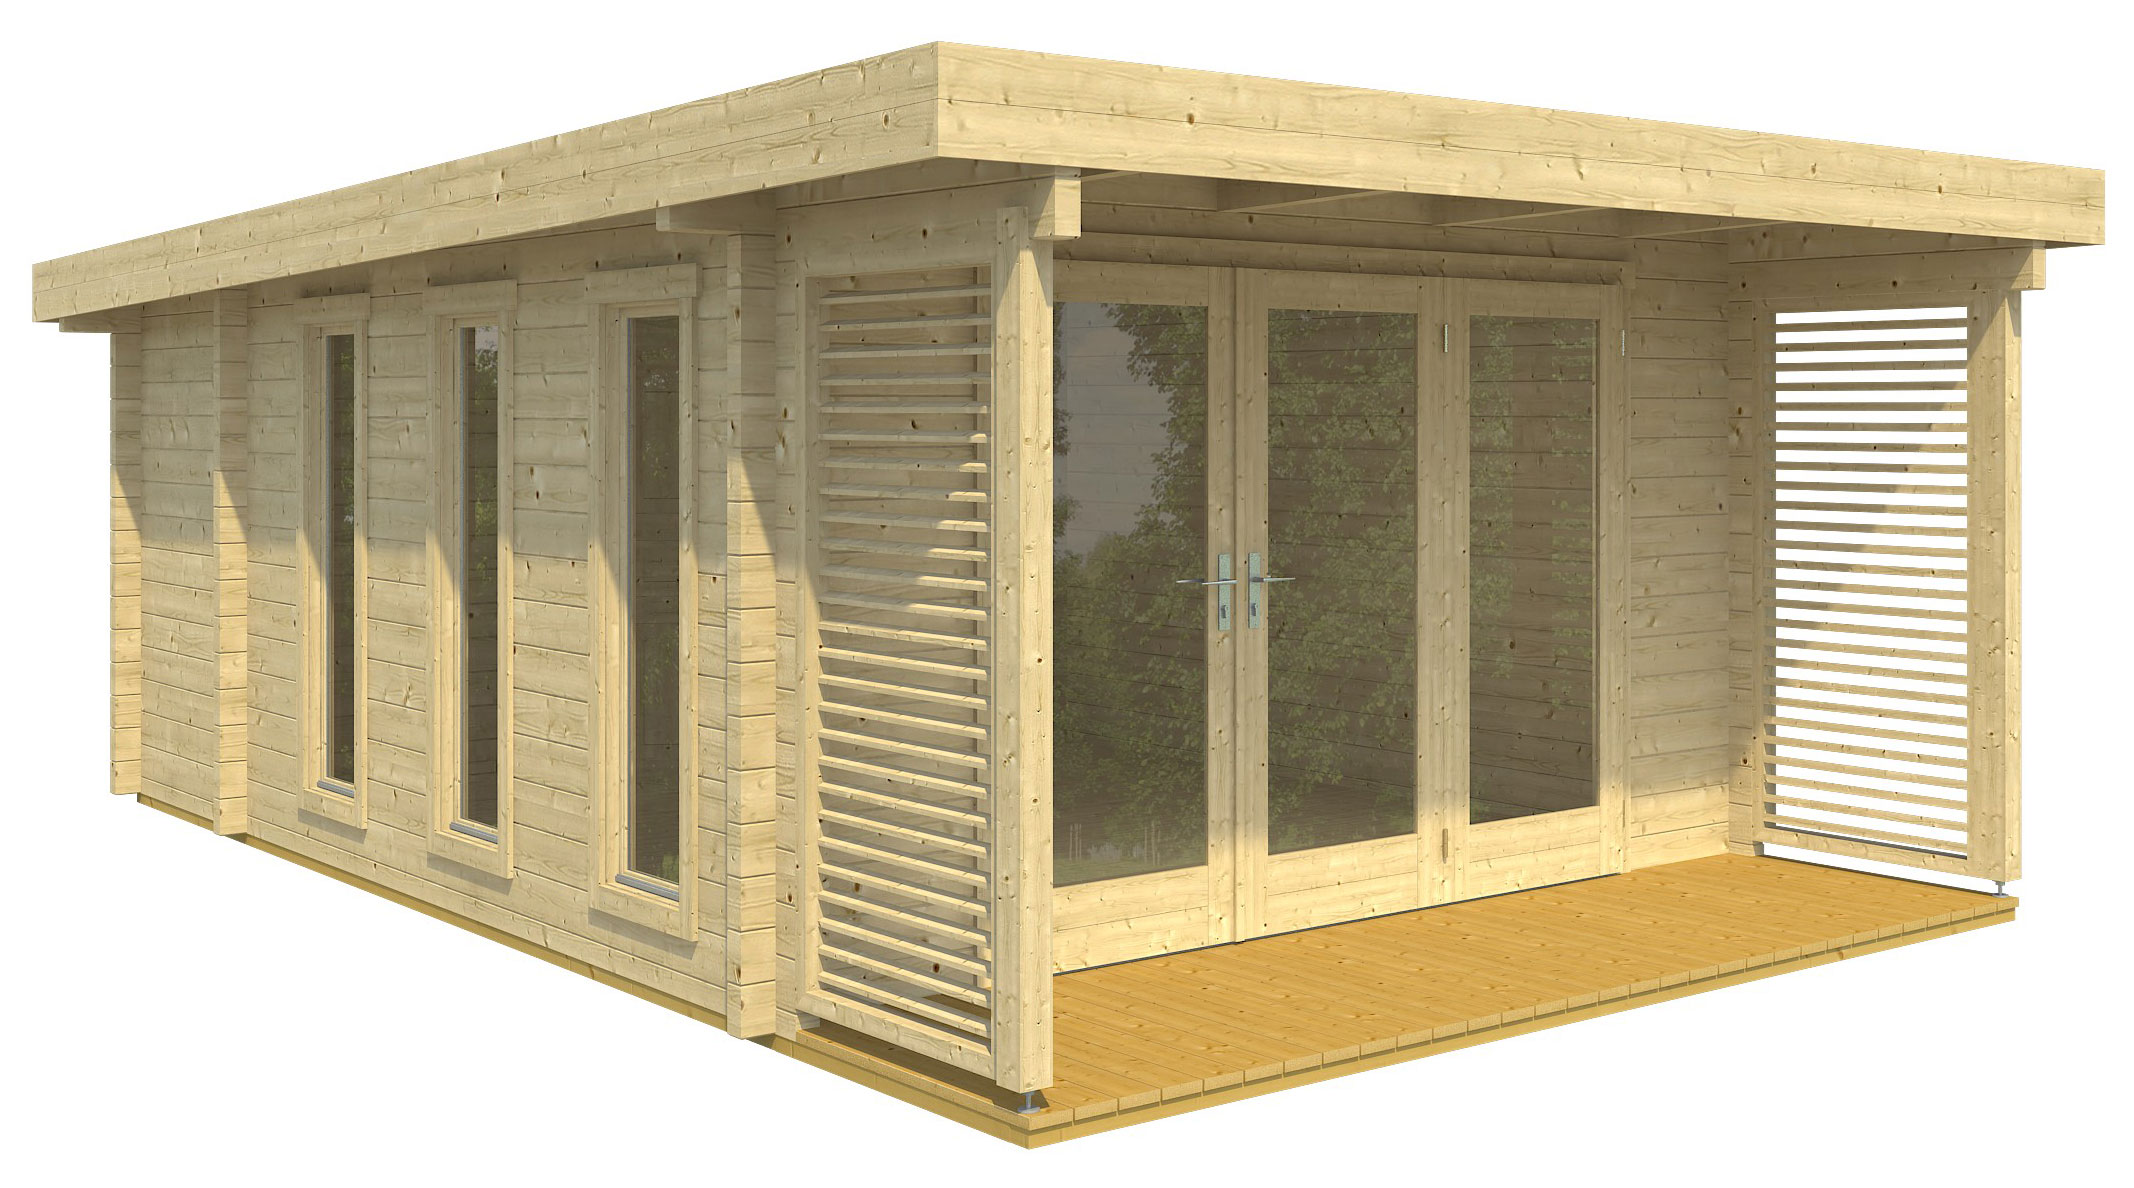 gartenhaus mit berdachter terrasse good skanholz. Black Bedroom Furniture Sets. Home Design Ideas